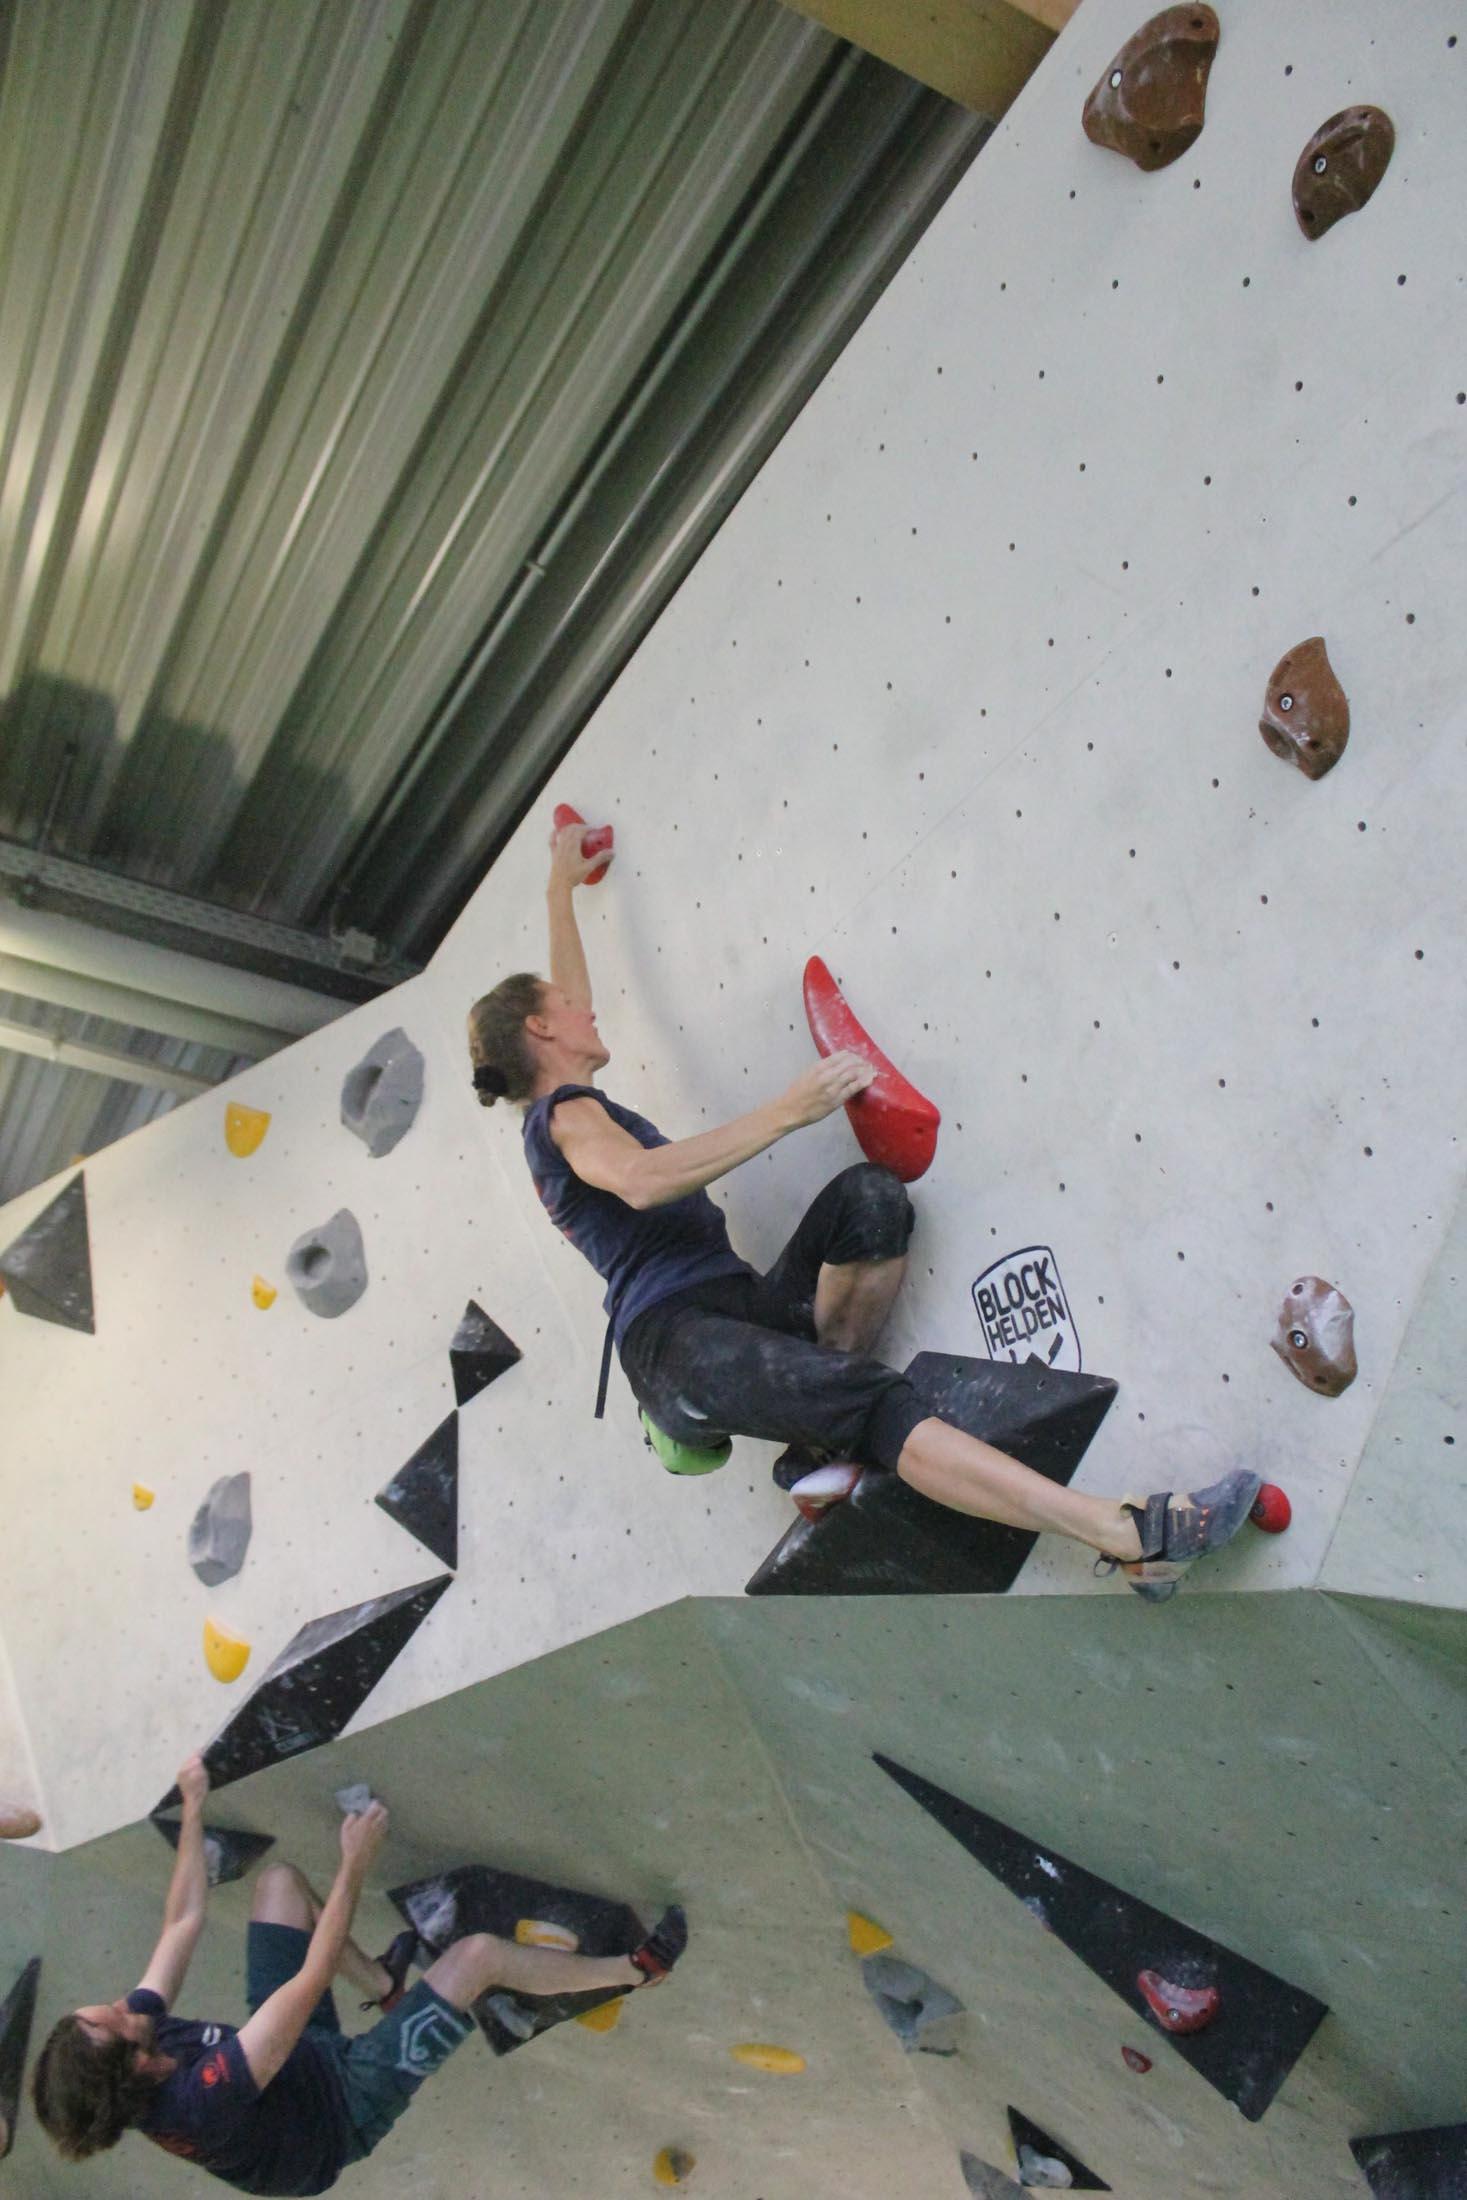 Quali, internationaler bouldercup Frankenjura 2016, BLOCKHELDEN Erlangen, Mammut, Bergfreunde.de, Boulderwettkampf07092016192